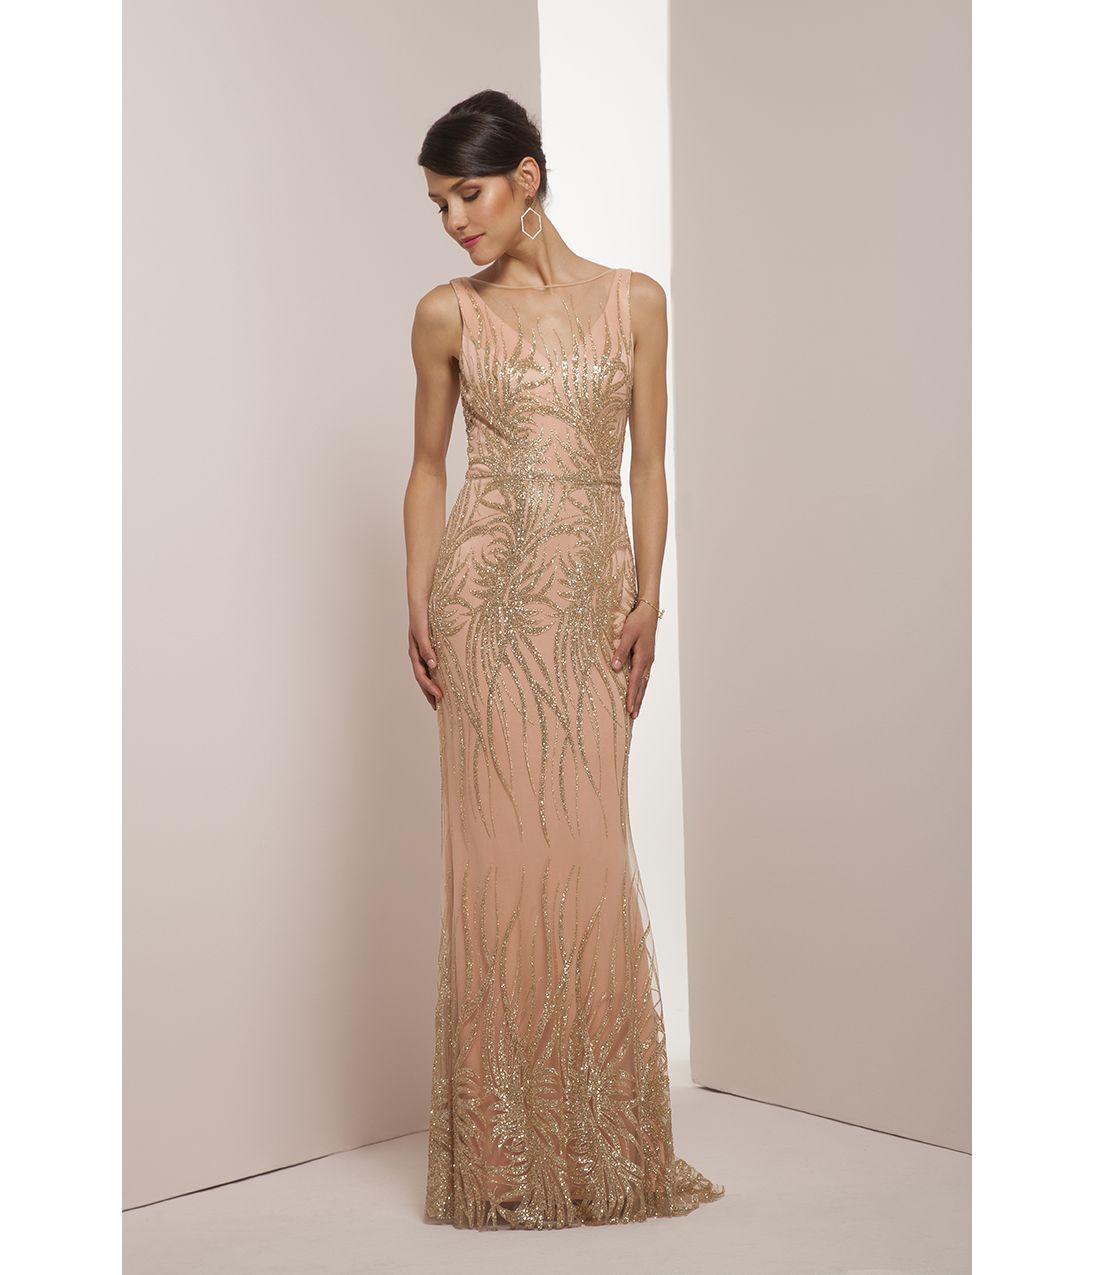 Great Gatsby Dress - Great Gatsby Costumes | Pinterest | Champagne ...